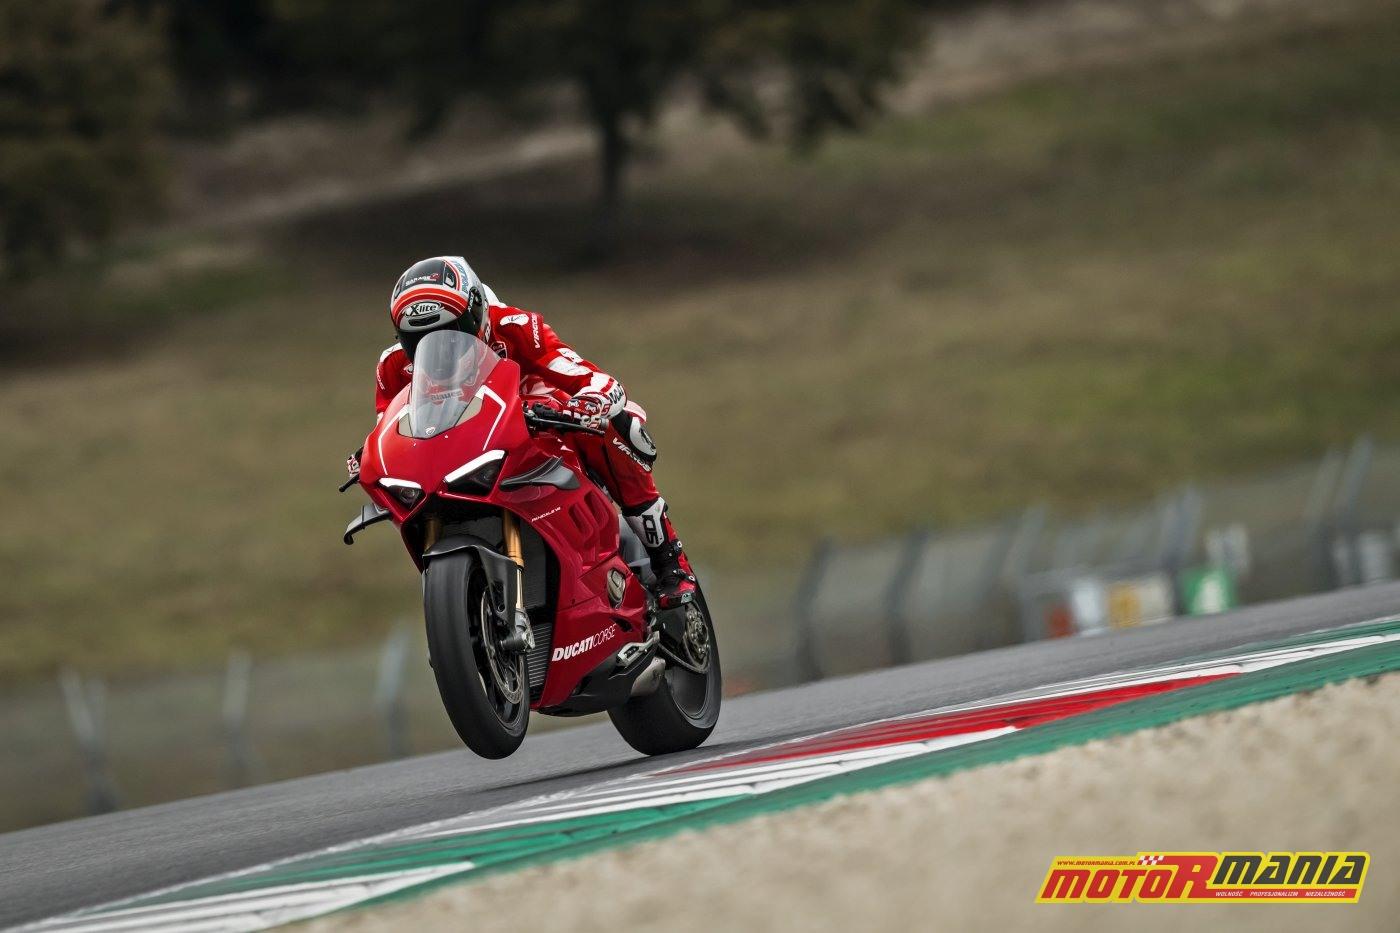 Ducati Panigale V4 R 2019 (46)